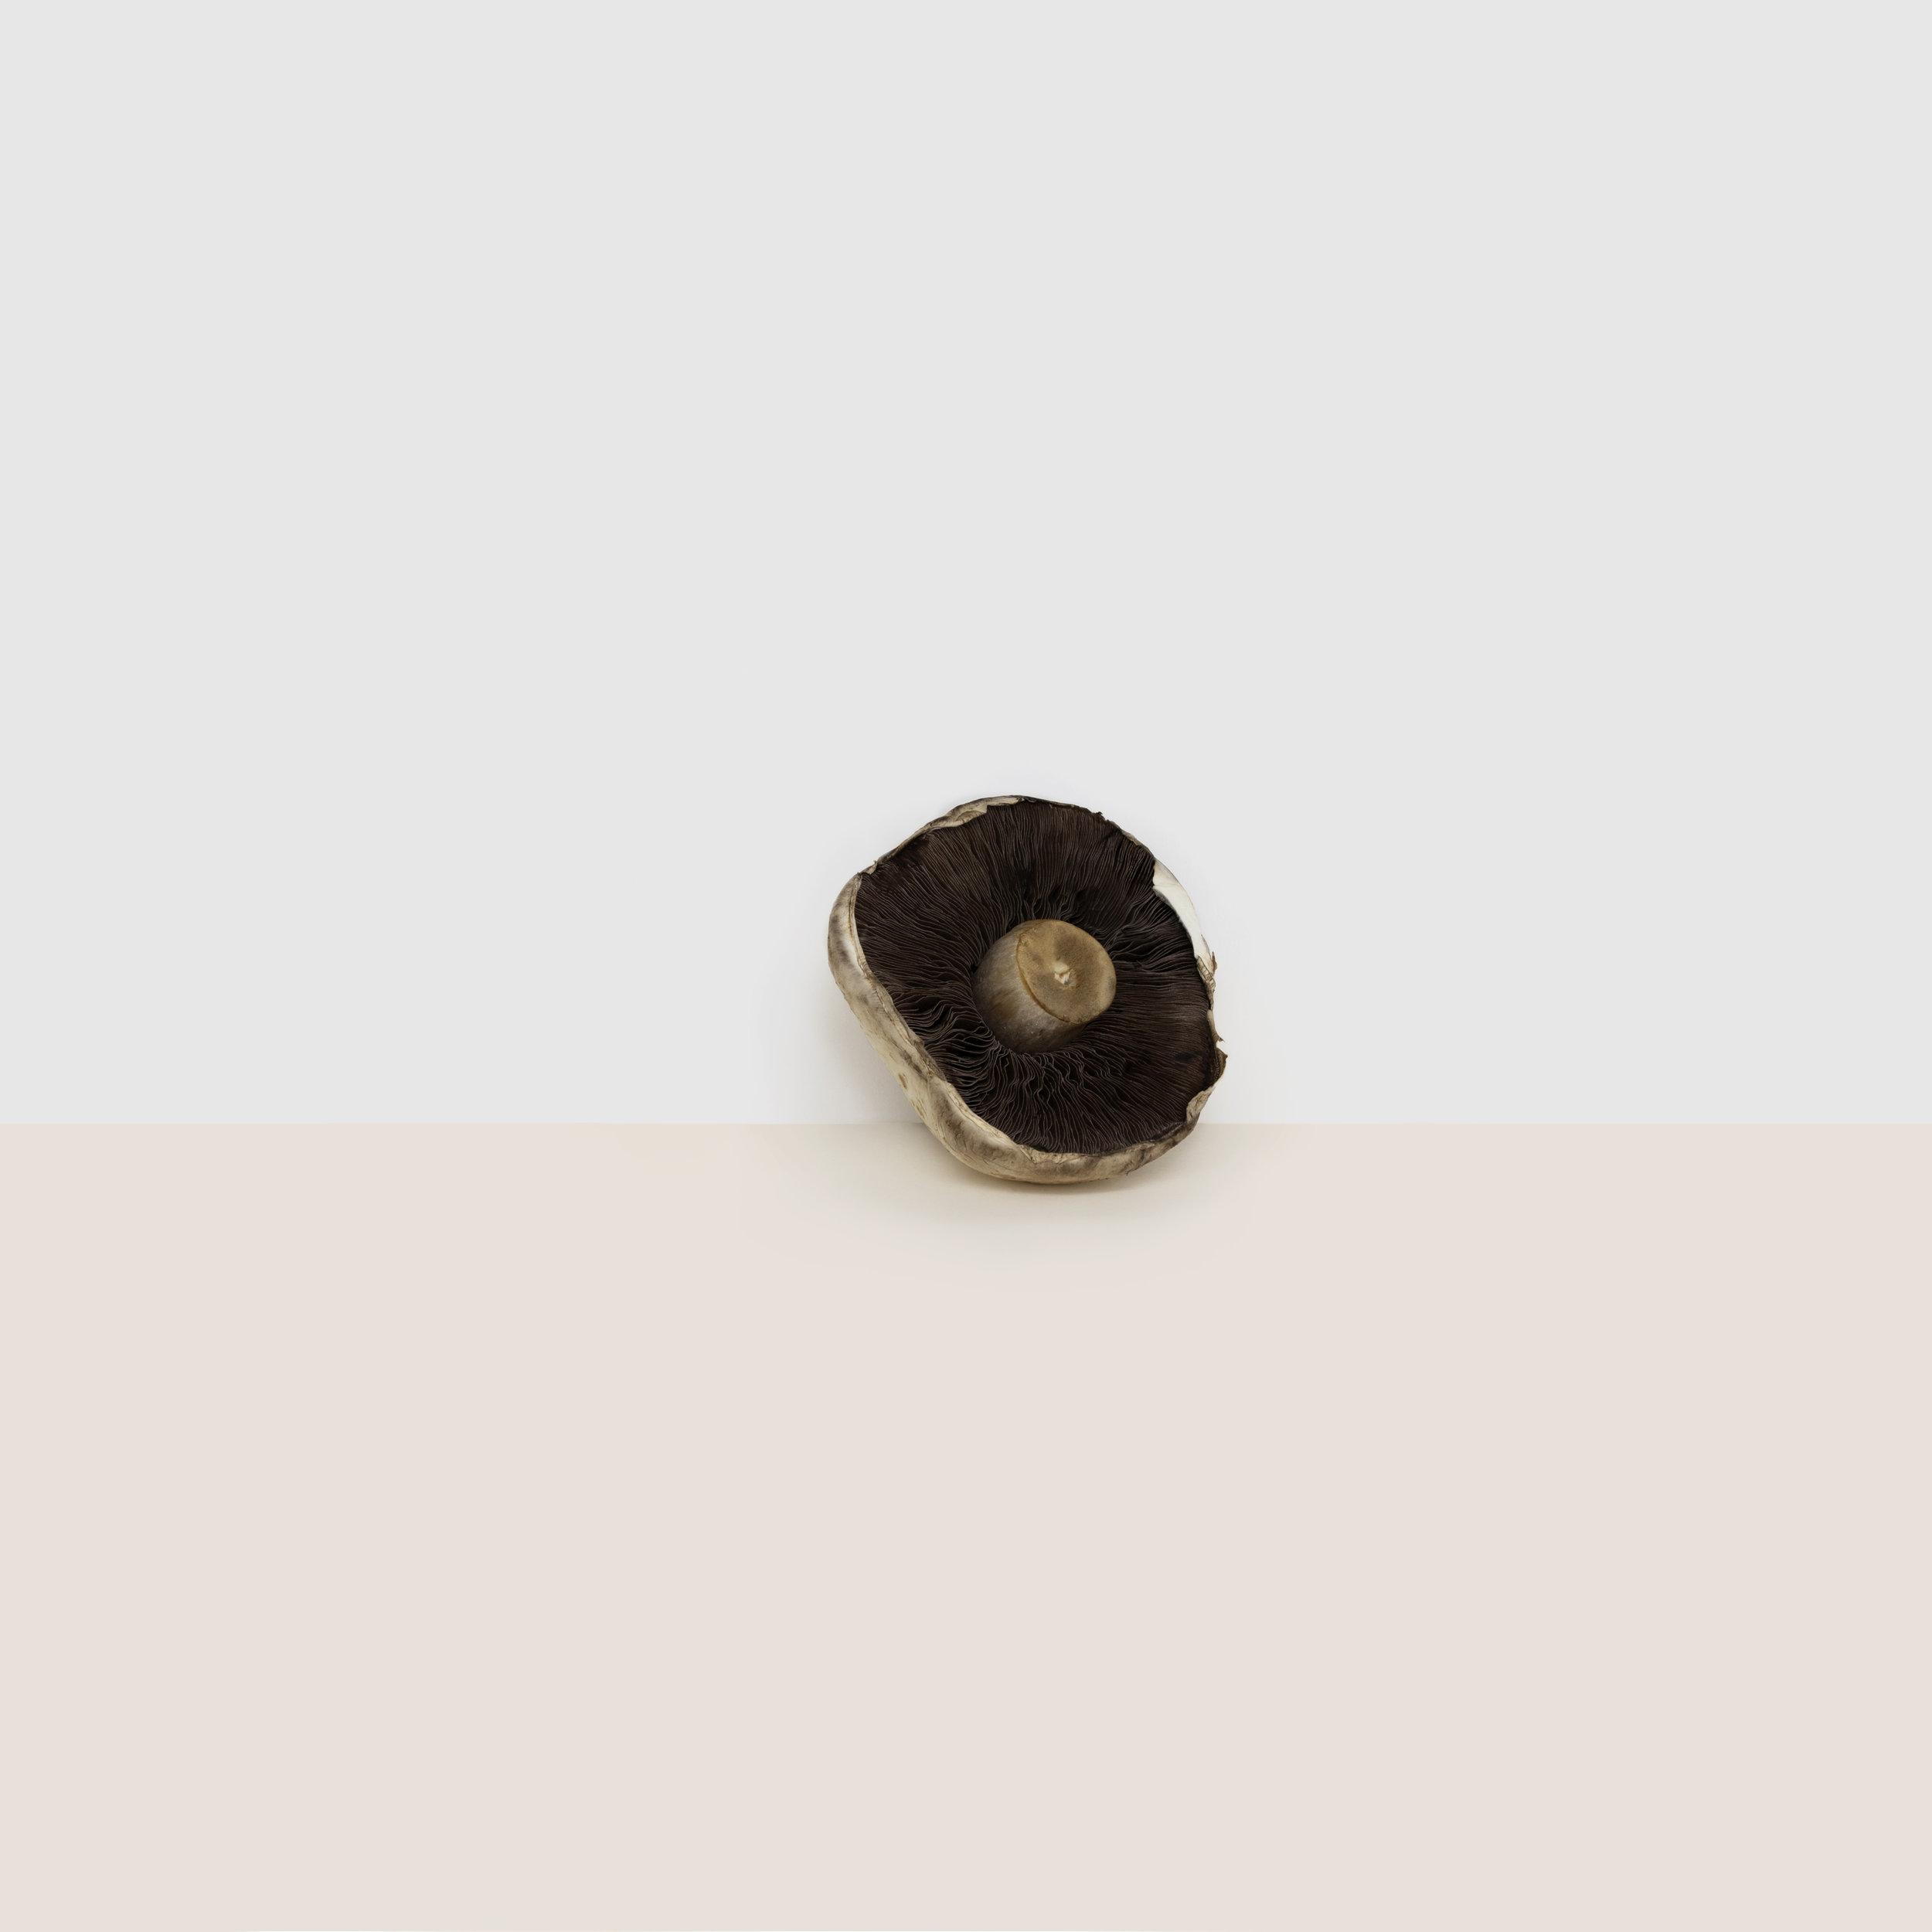 A simple, minimalist, contemporary, fine art photograph of a mushroom